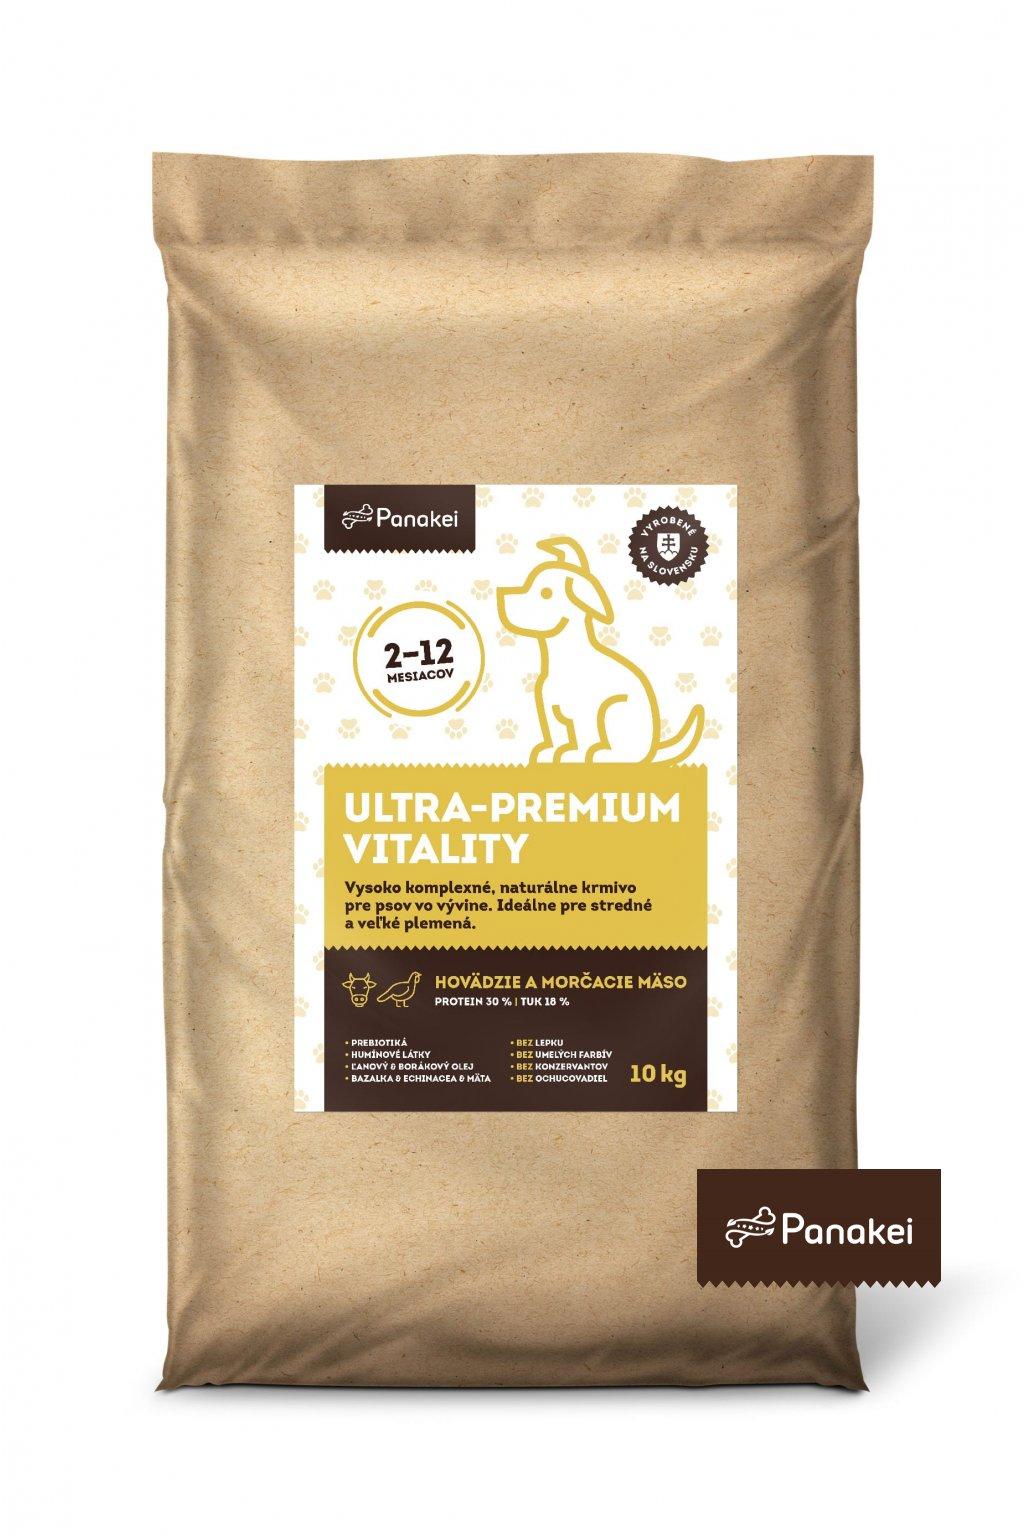 Pack2 ULTRAPREMIUM VITALITY stenata M+L+XL 10kg 3 min